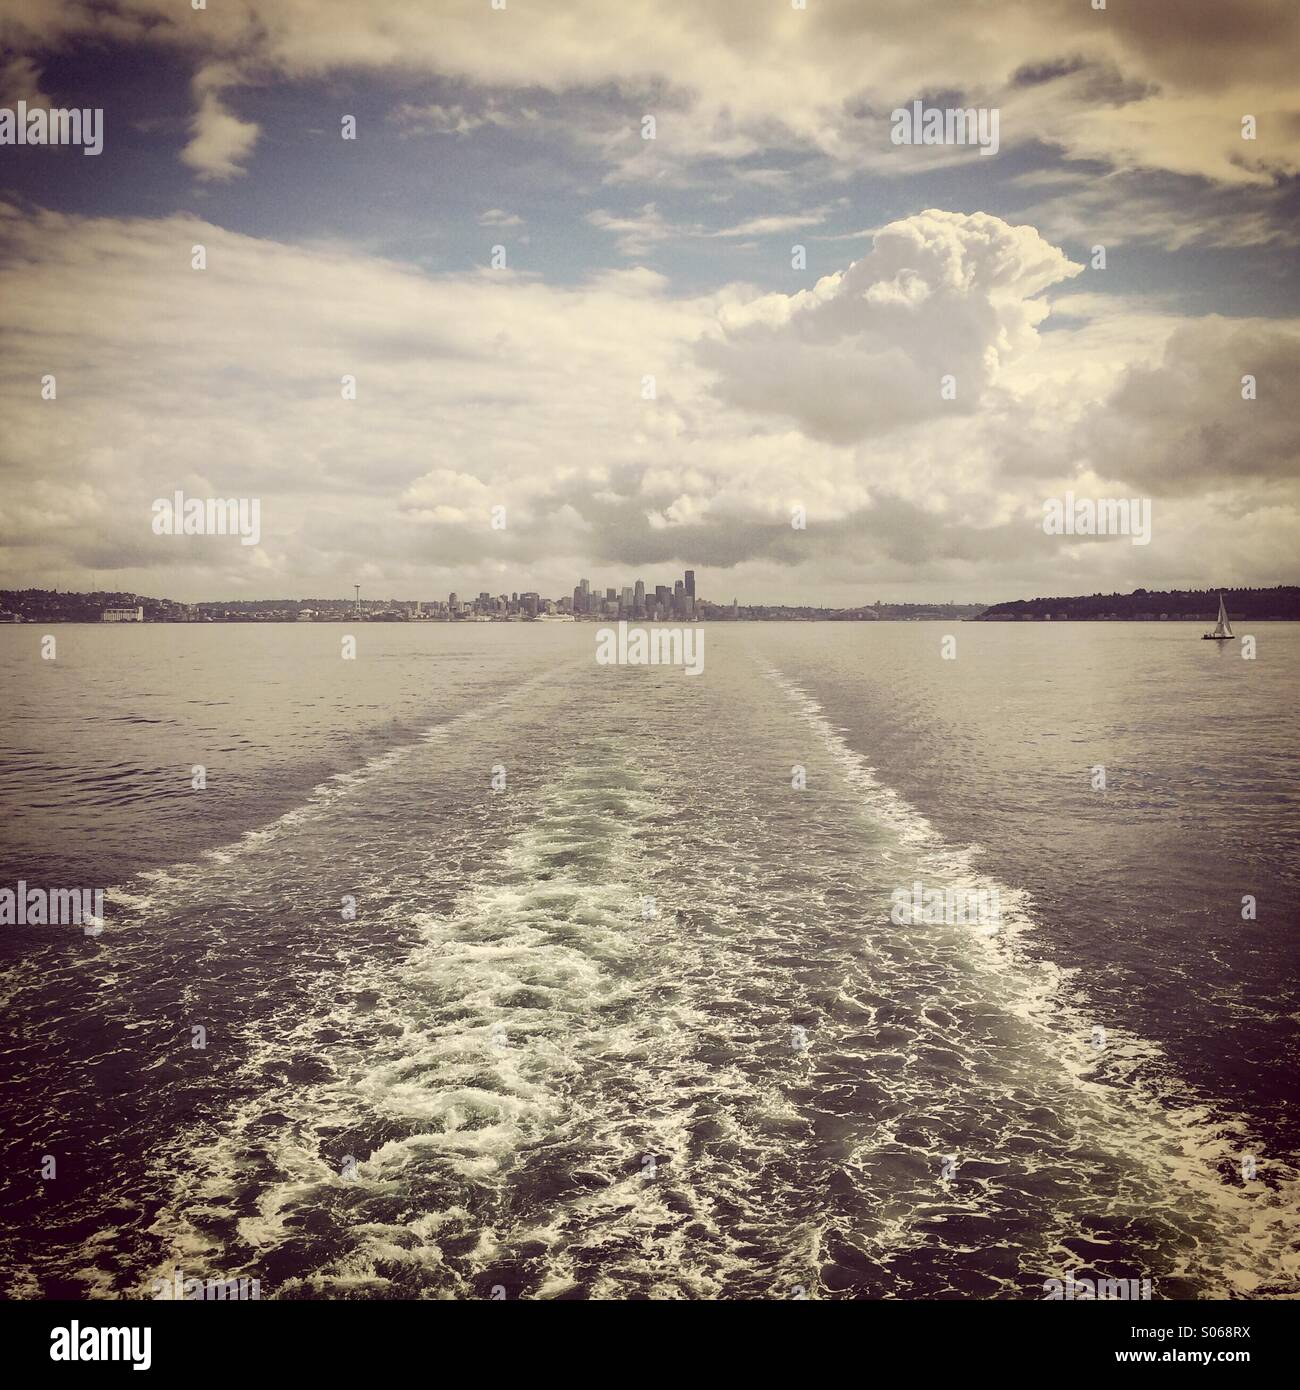 Seattle skyline from ferry boat, Puget Sound, Seattle, Washington - Stock Image